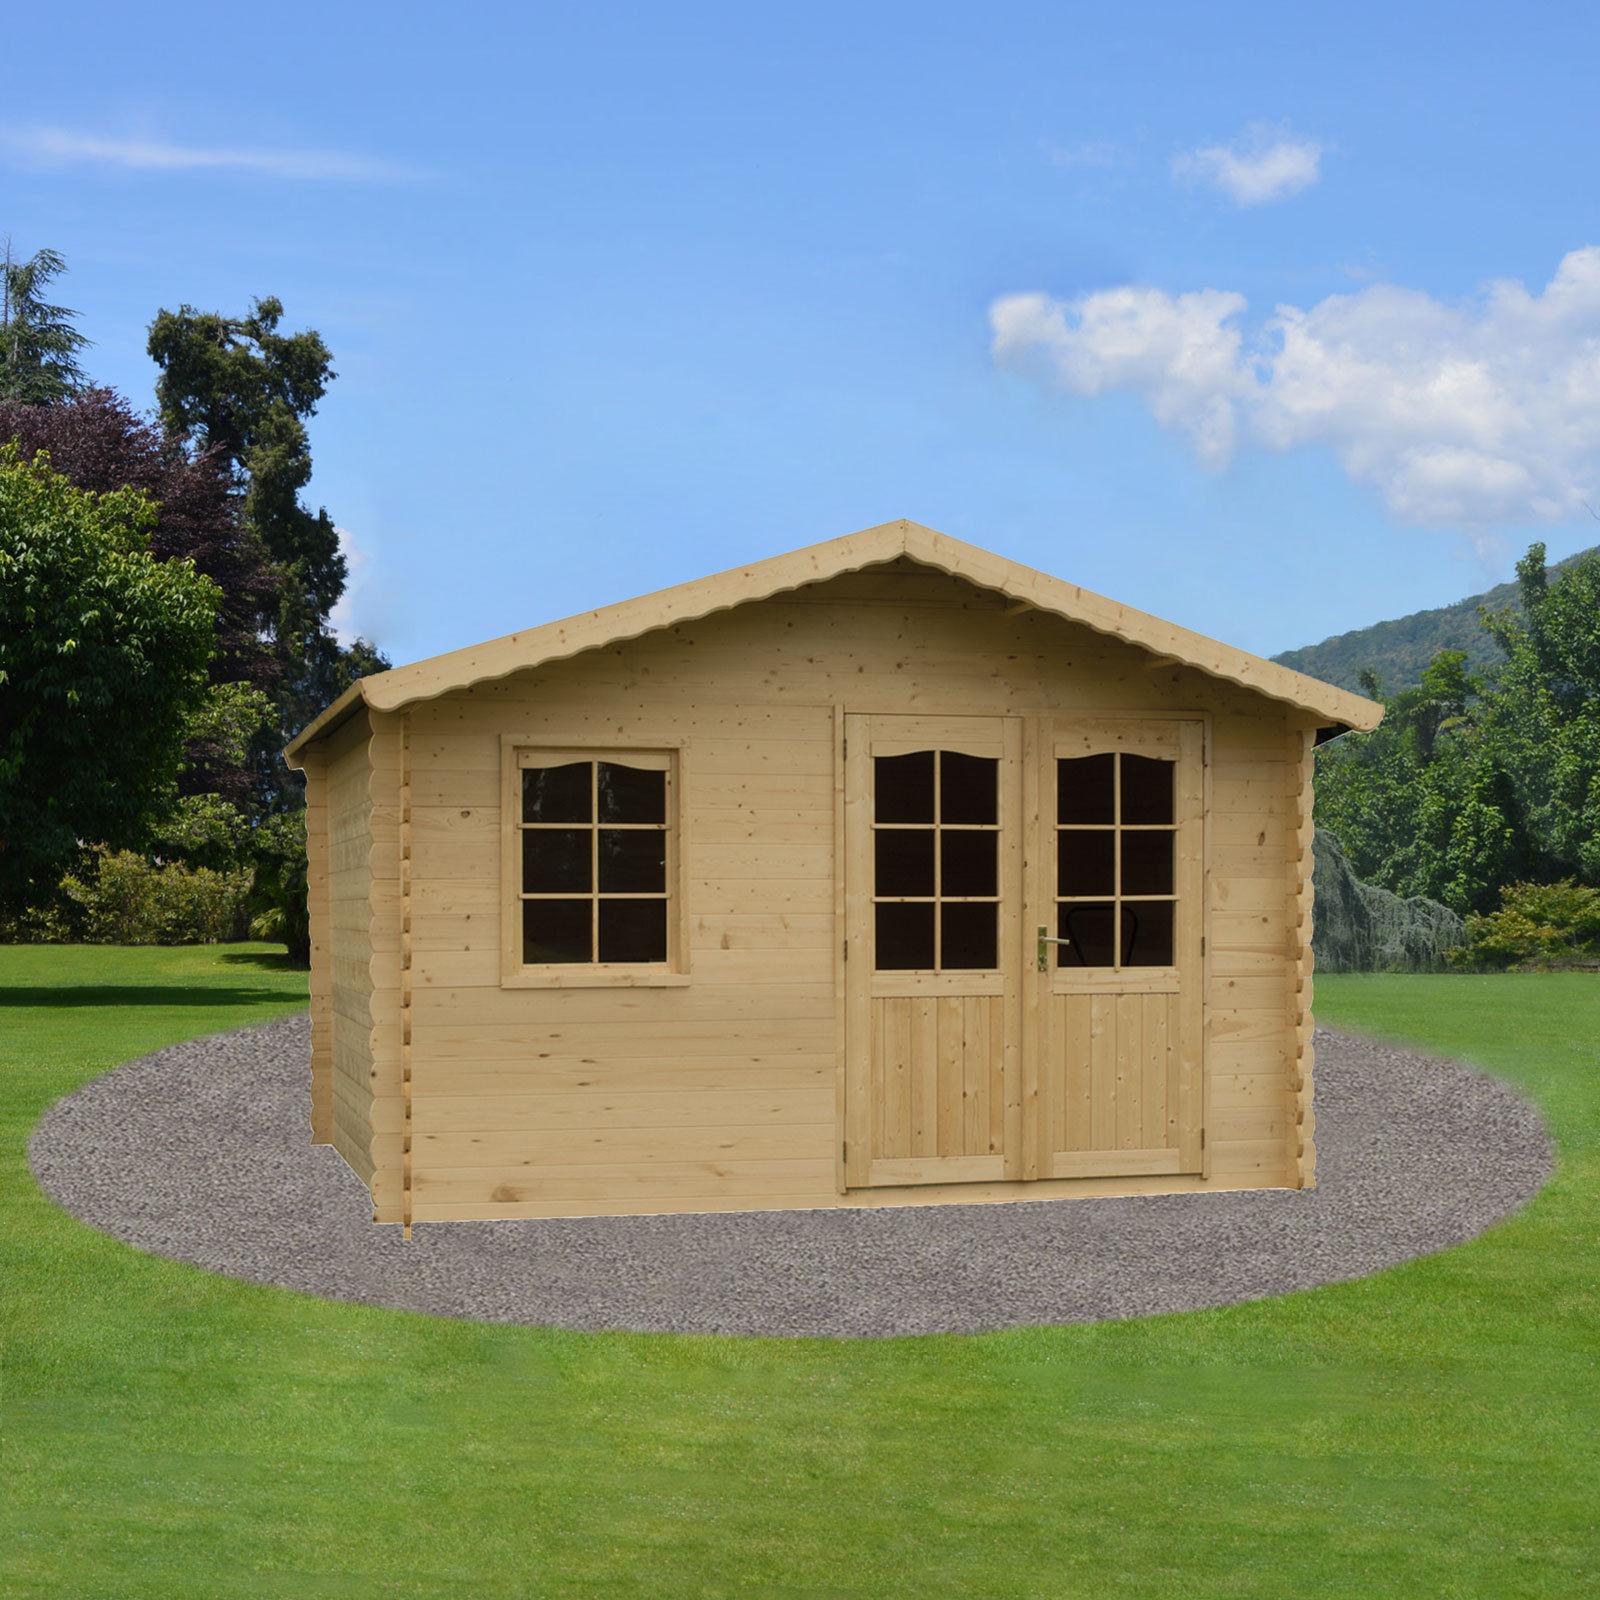 M M Holzhaus hori gartenhaus 28 mm holzhaus gerätehaus schuppen div modelle und